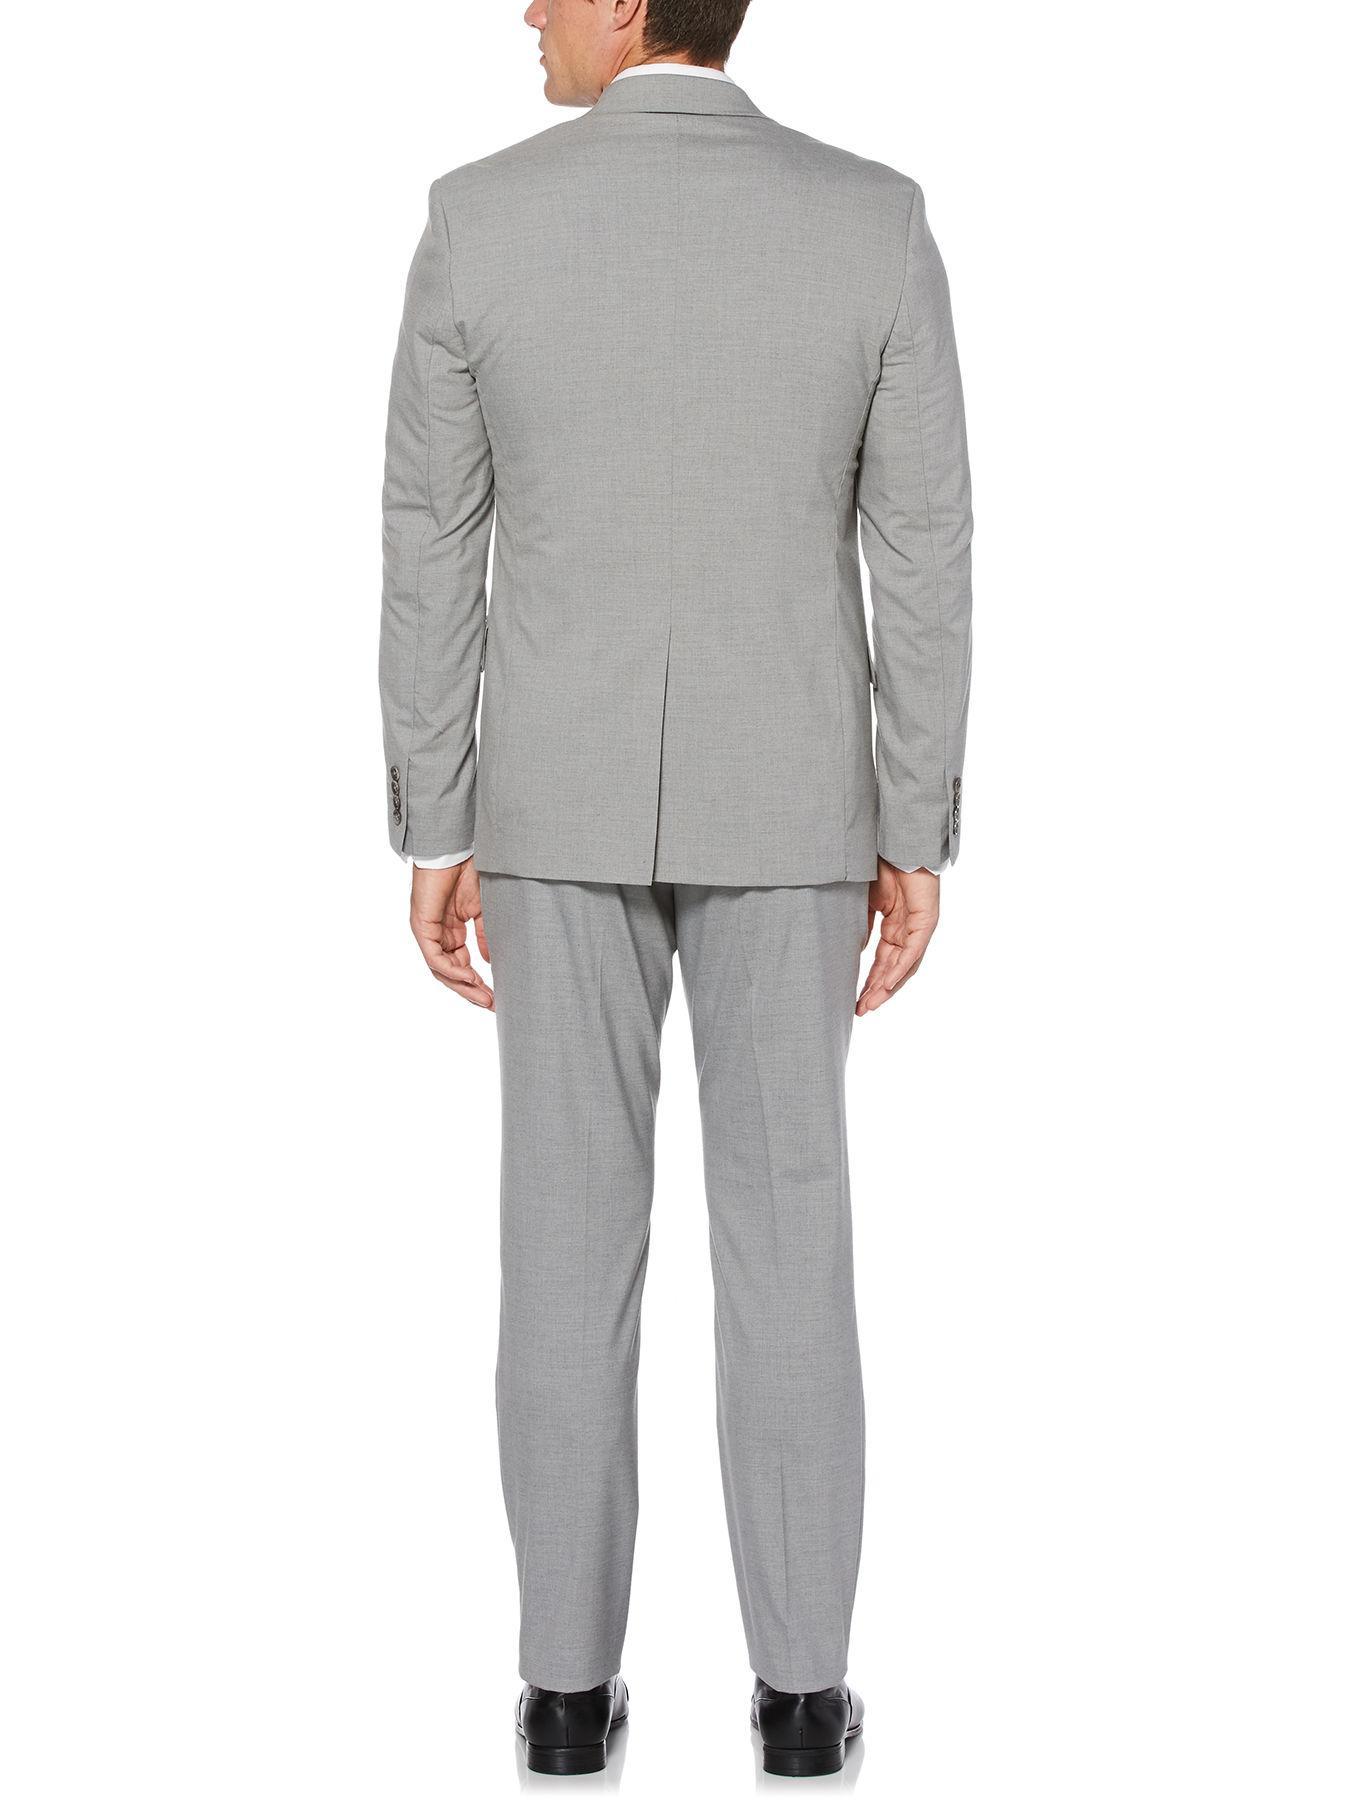 8e28231de1 Perry Ellis - Gray Modern Fit Heathered Suit Jacket for Men - Lyst. View  fullscreen